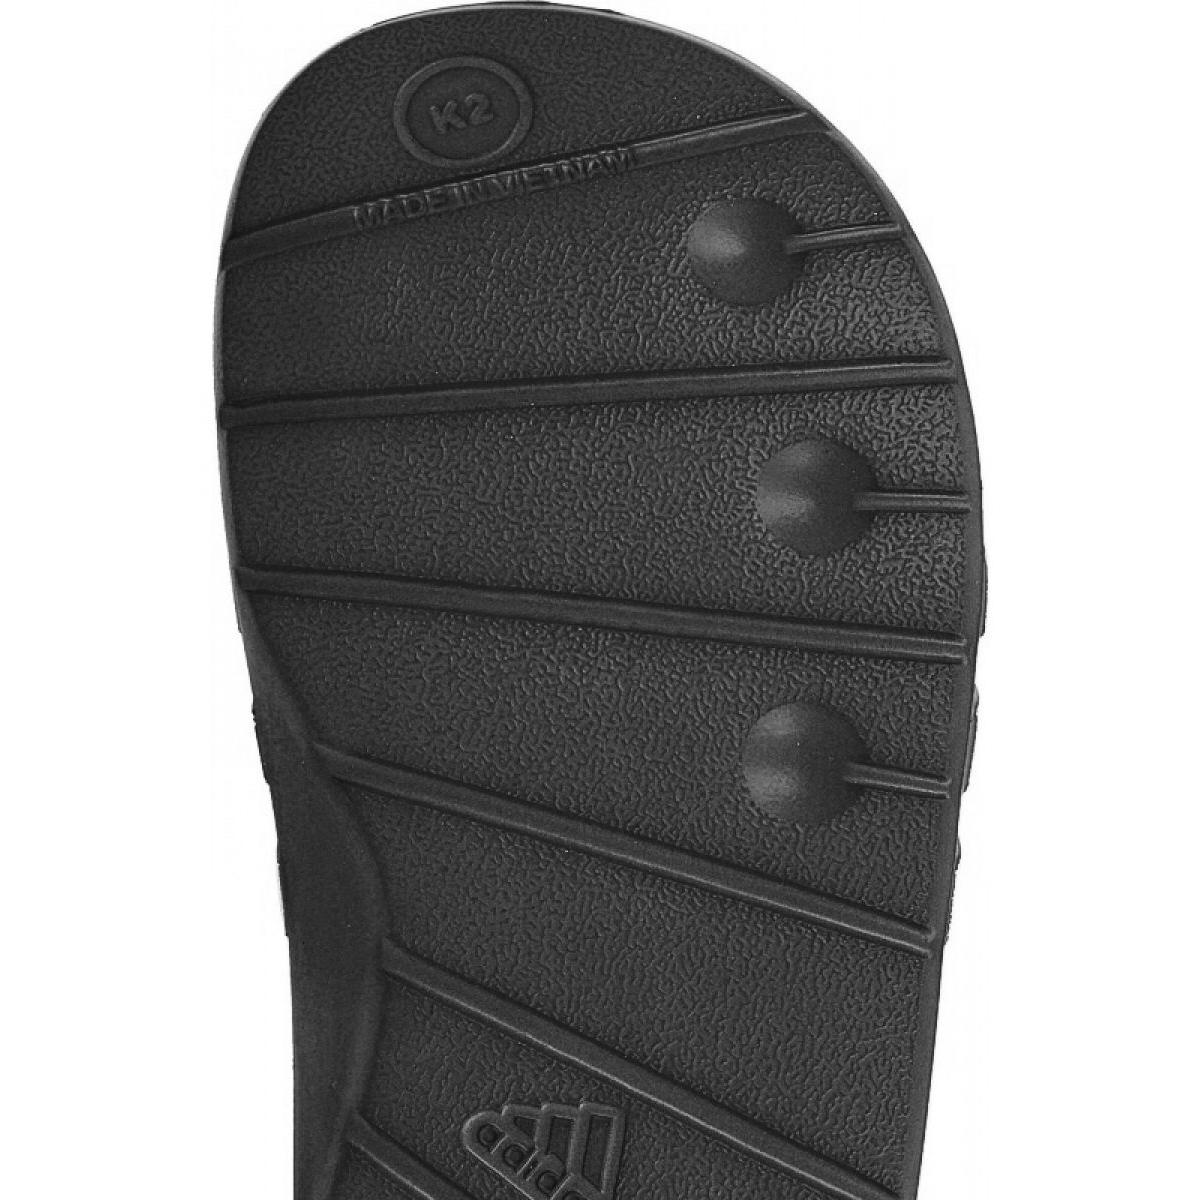 precisamente mediodía Salida  zapatos de natación adidas duramo slides verde niños gzae60b ...